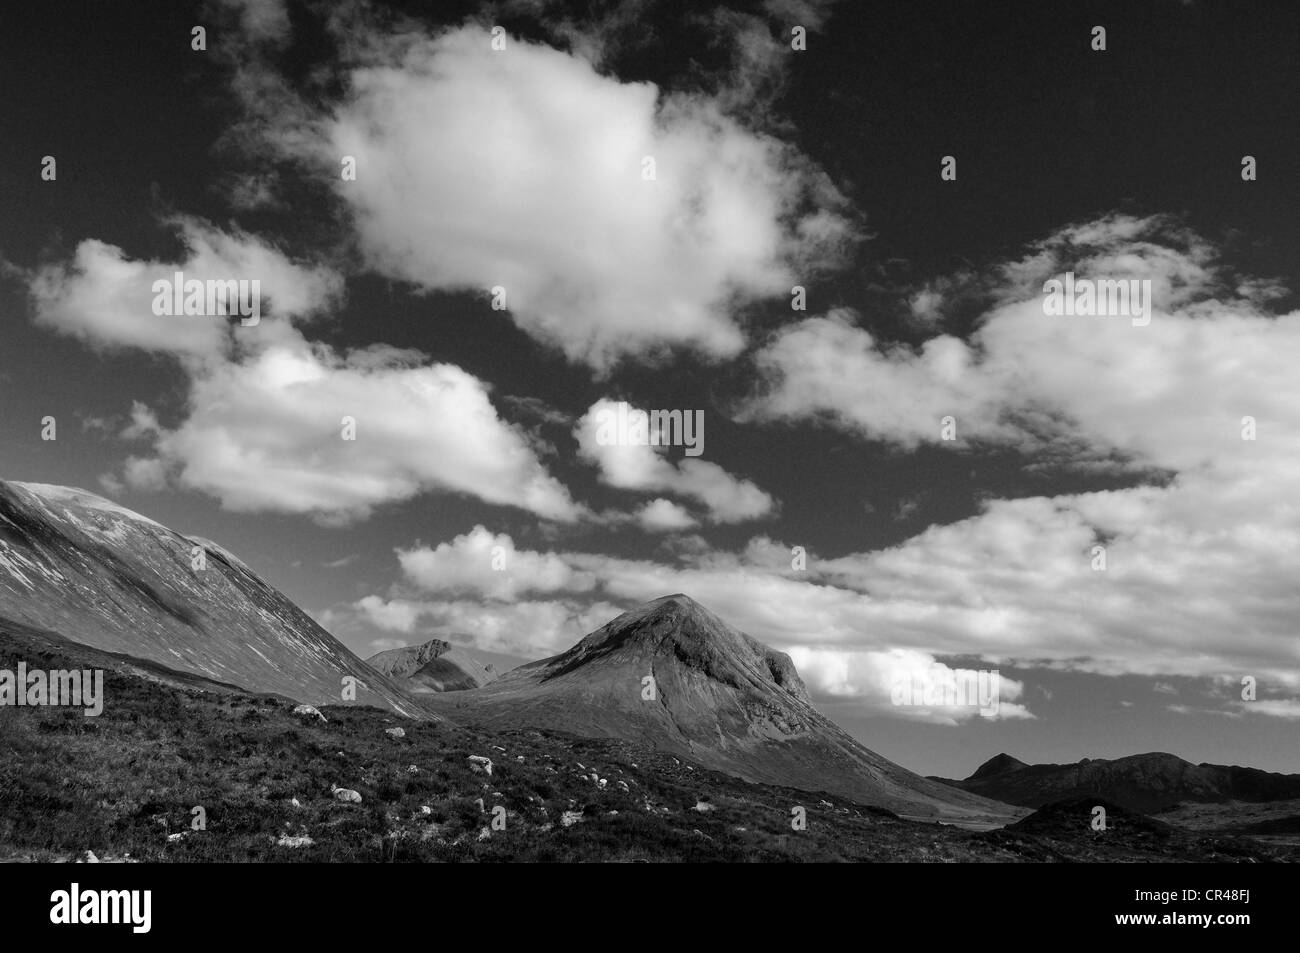 Dramatic skies over Marsco and Glen Sligachan, Isle of Skye, Inner Hebrides, Scotland - Stock Image